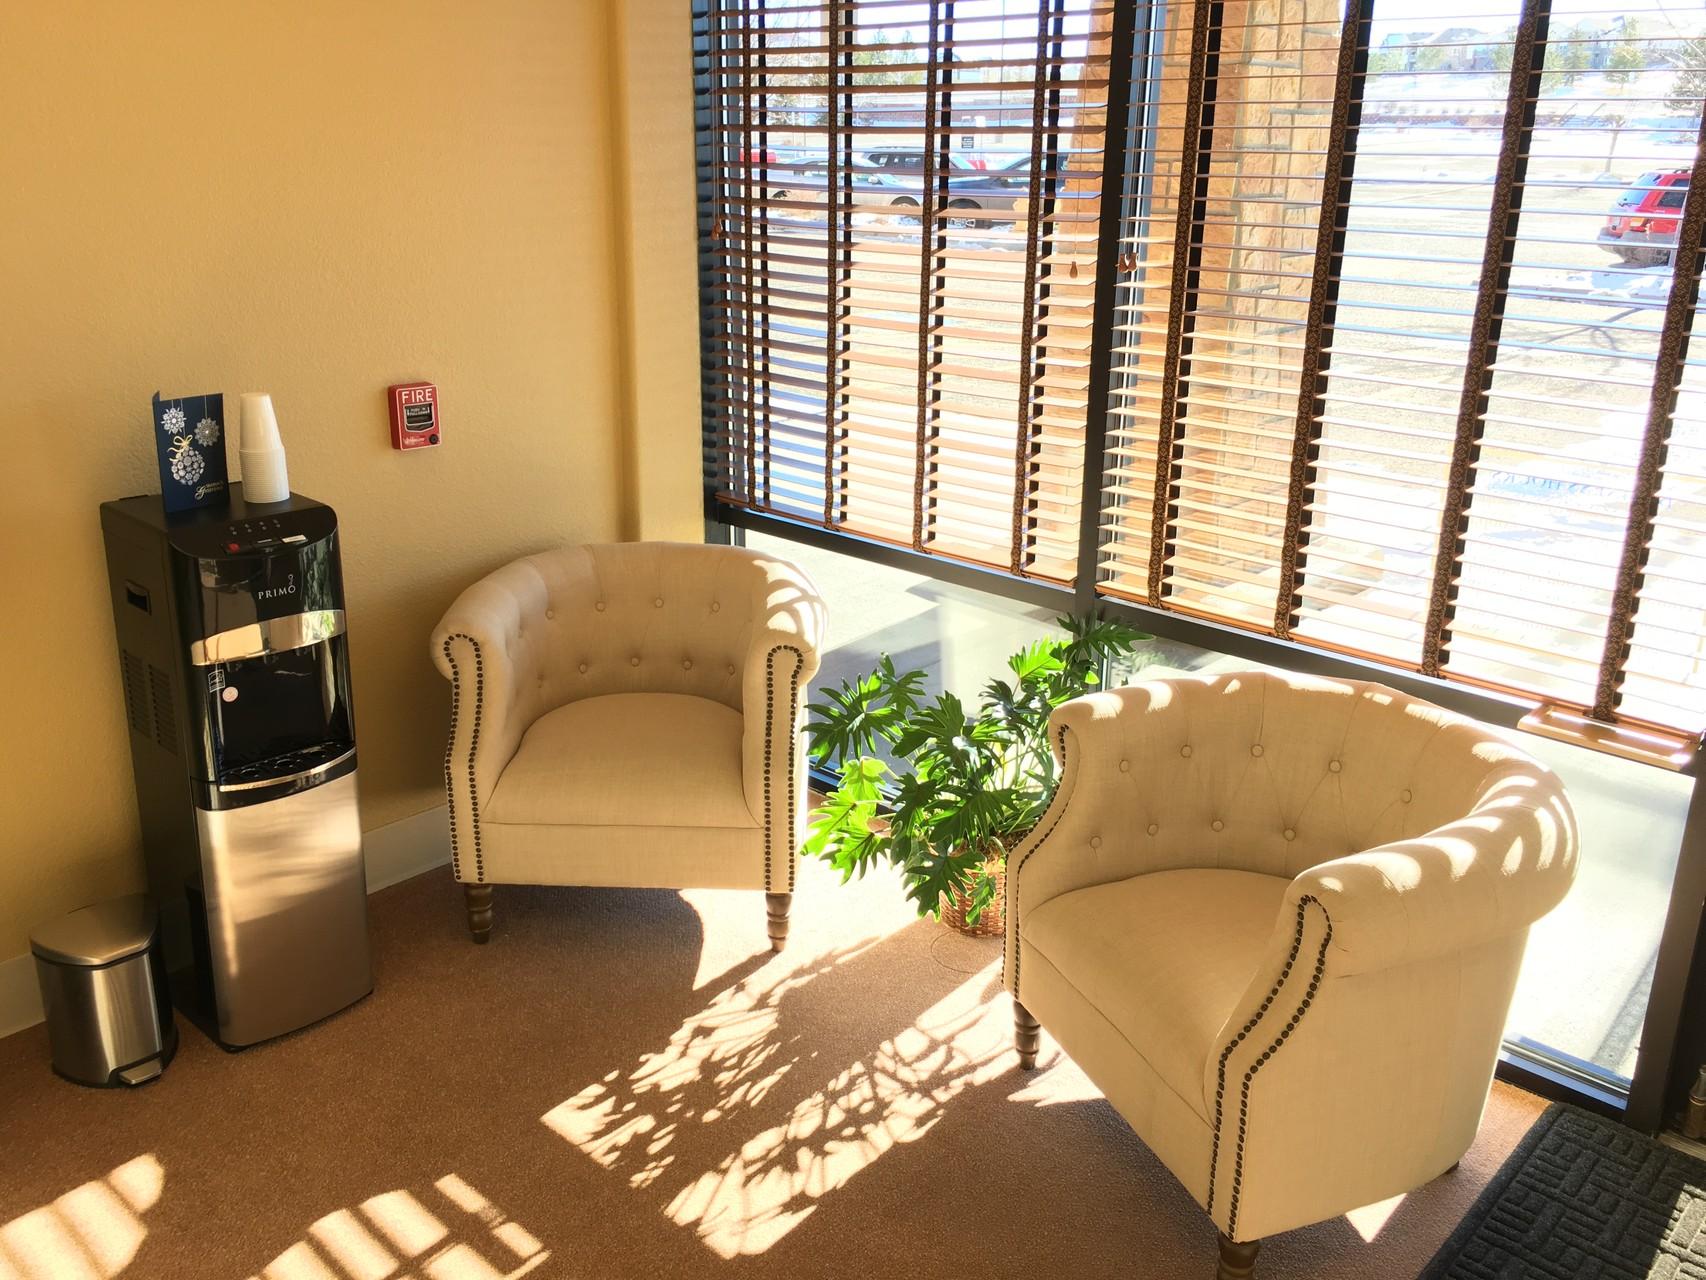 Lobby | Sitting area